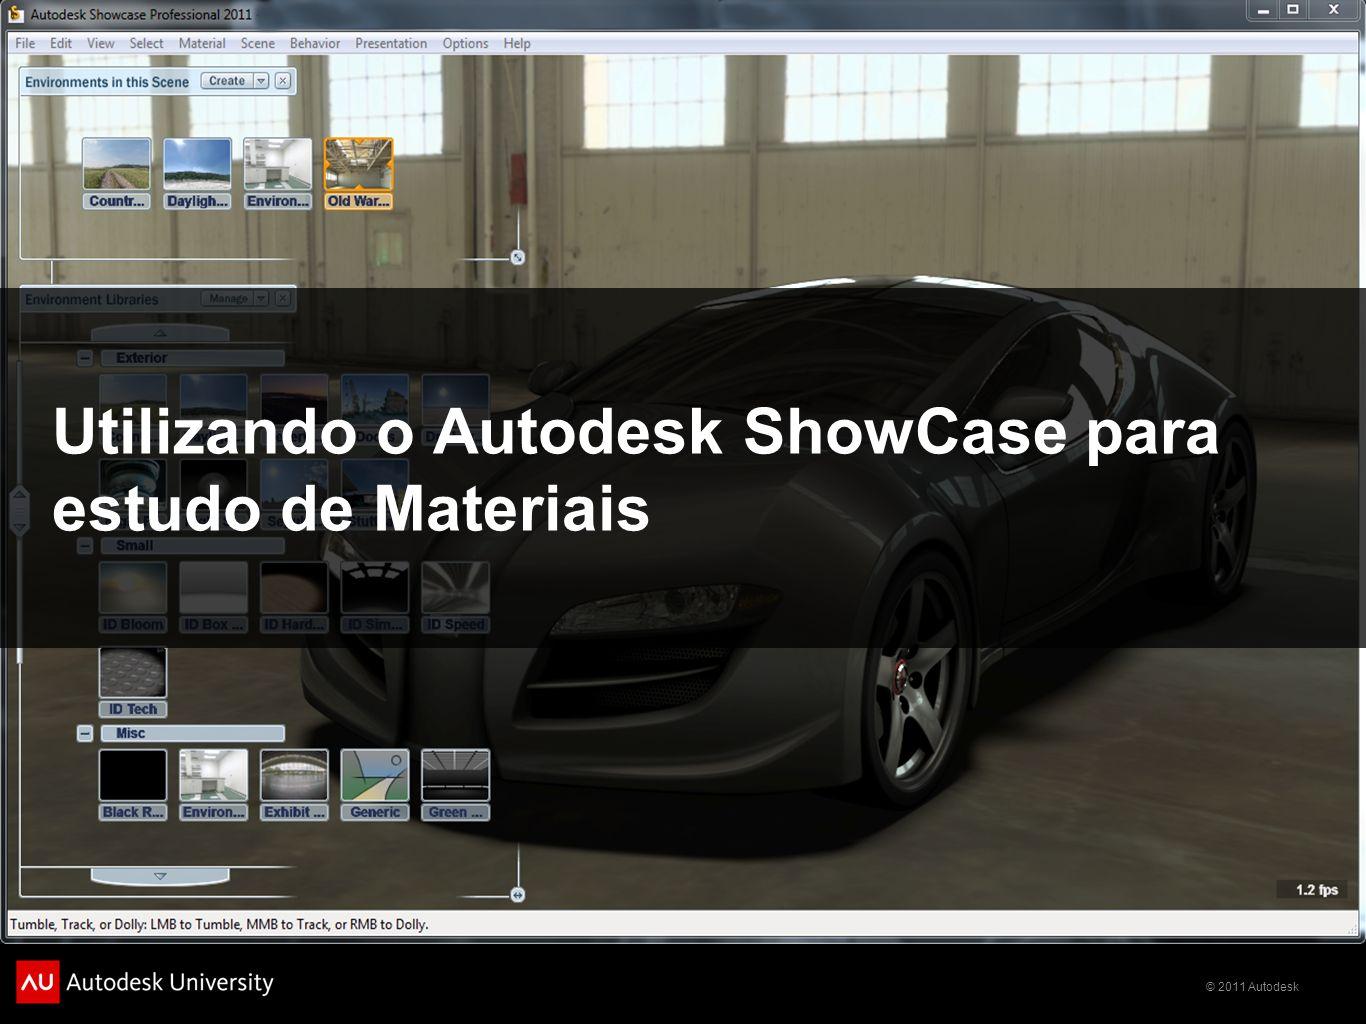 Utilizando o Autodesk ShowCase para estudo de Materiais